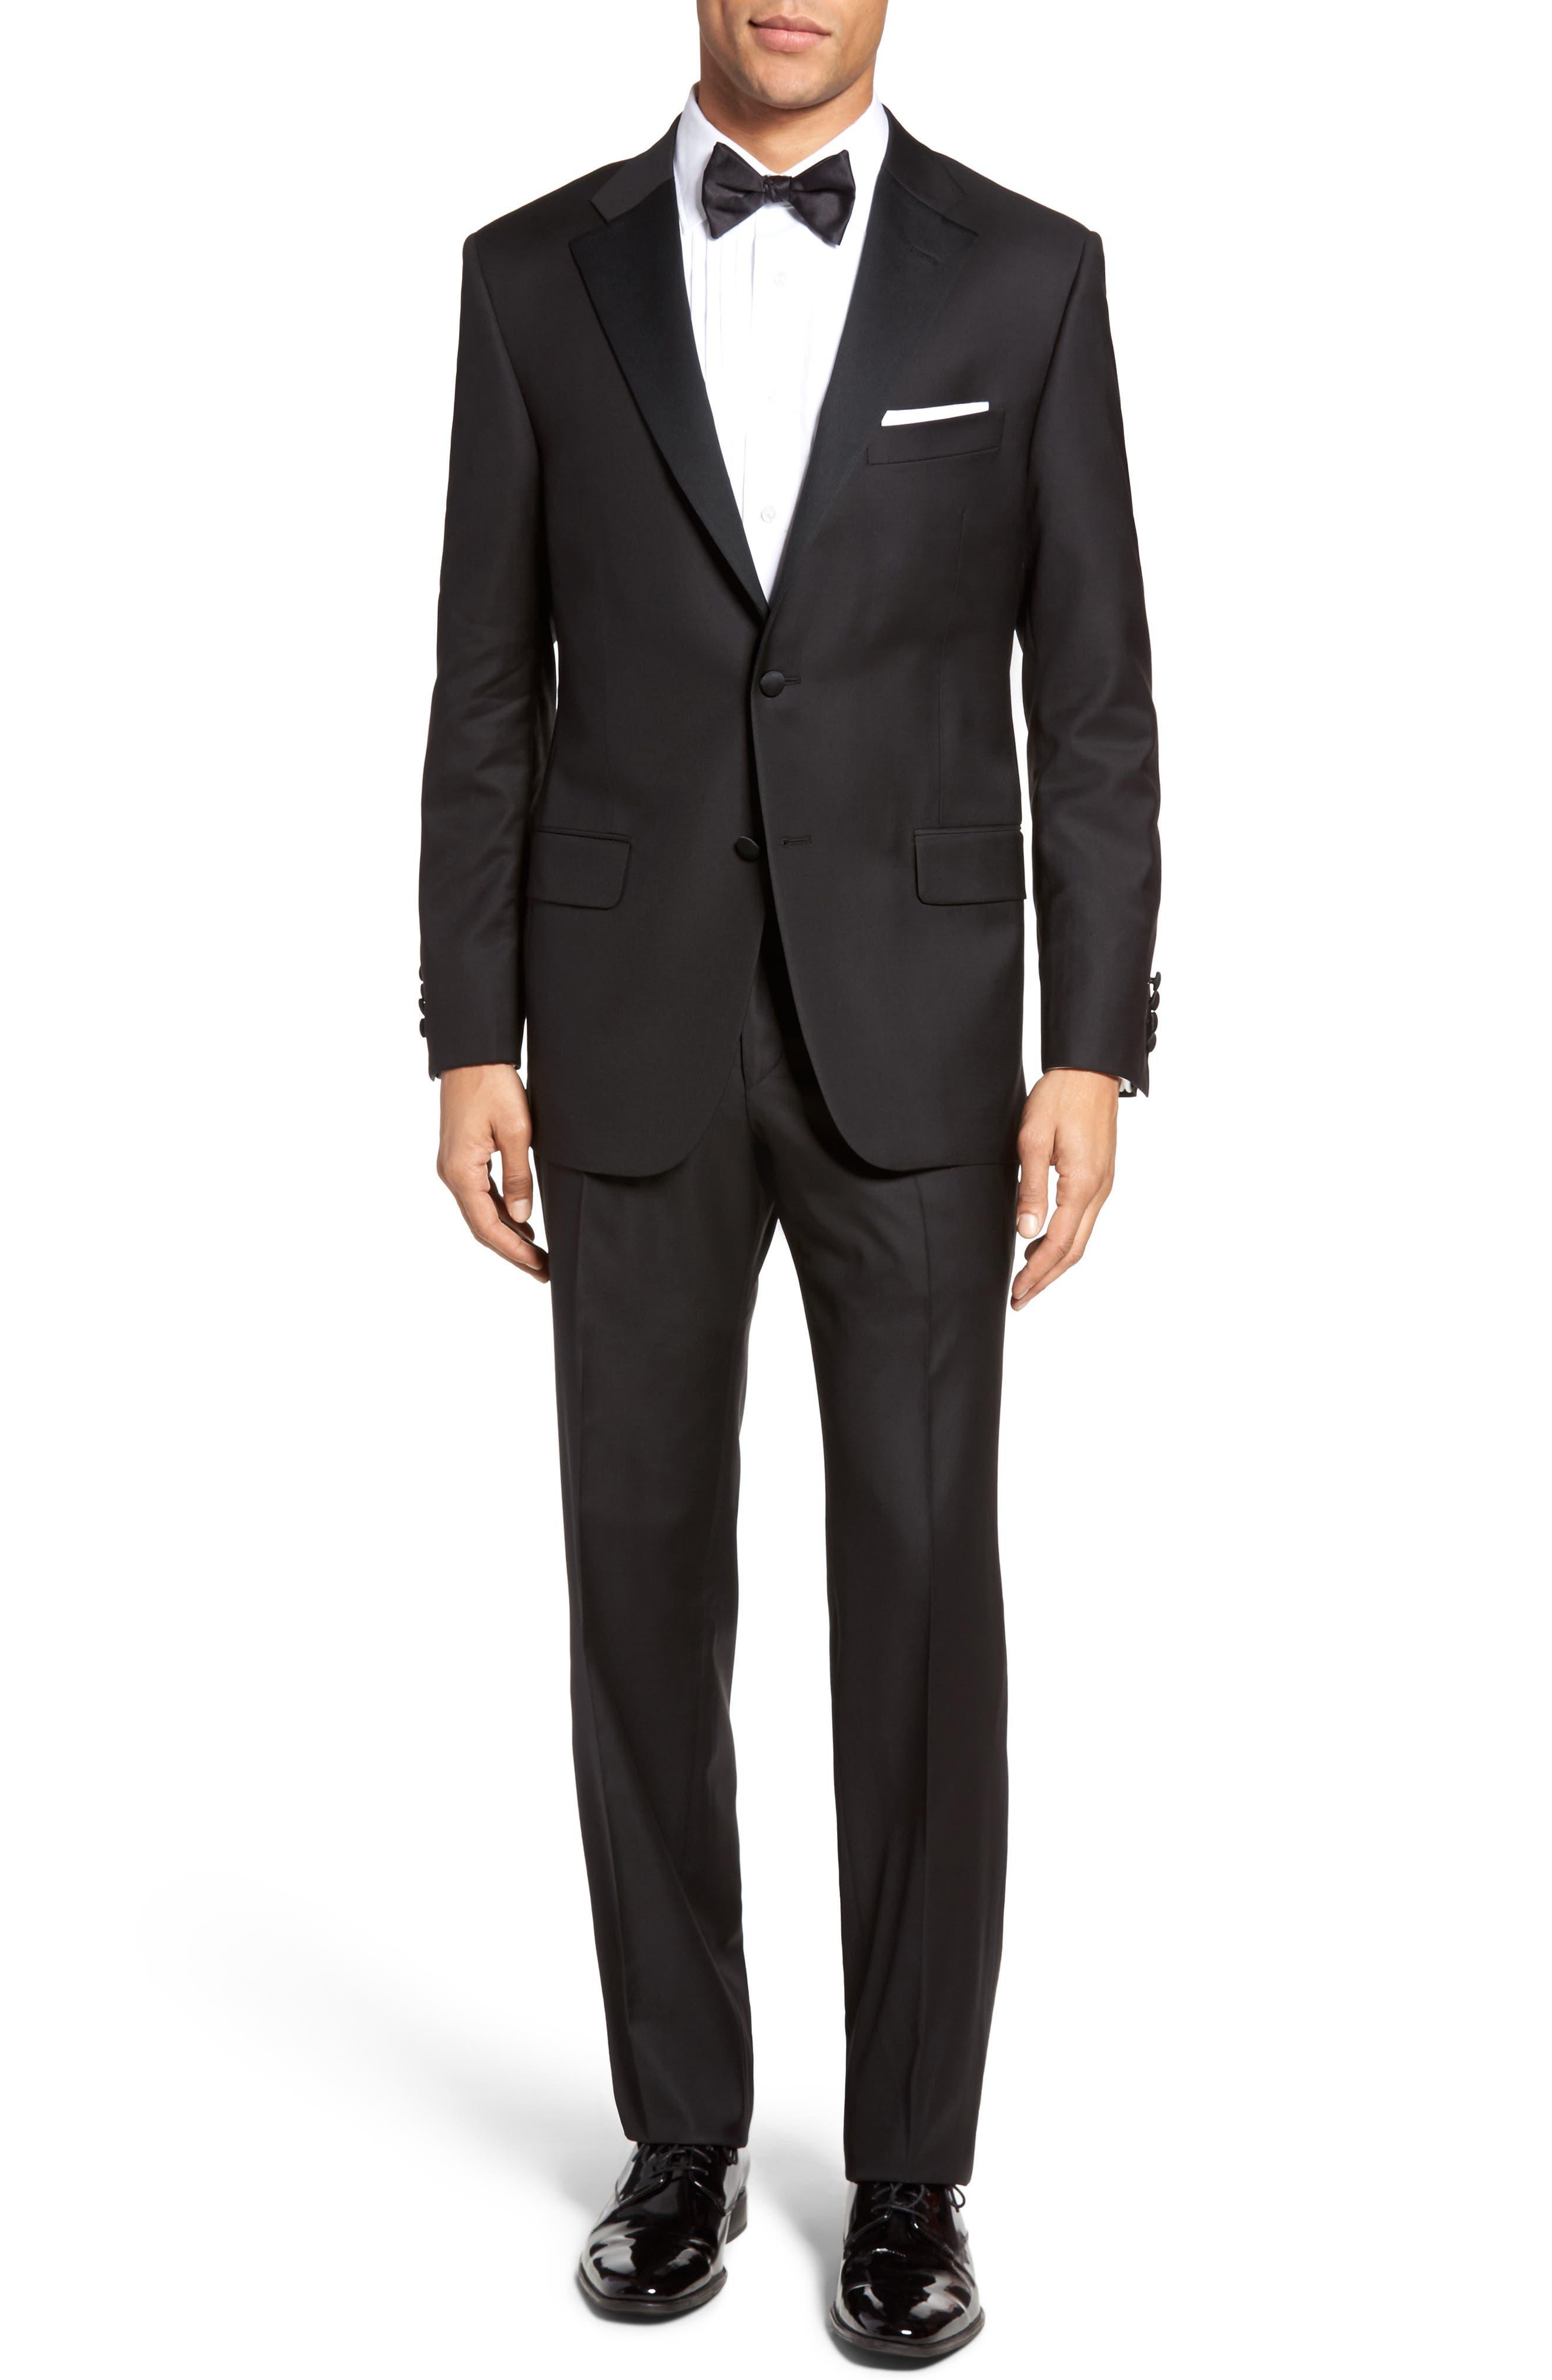 HICKEY FREEMAN Beacon Classic Fit Wool Tuxedo